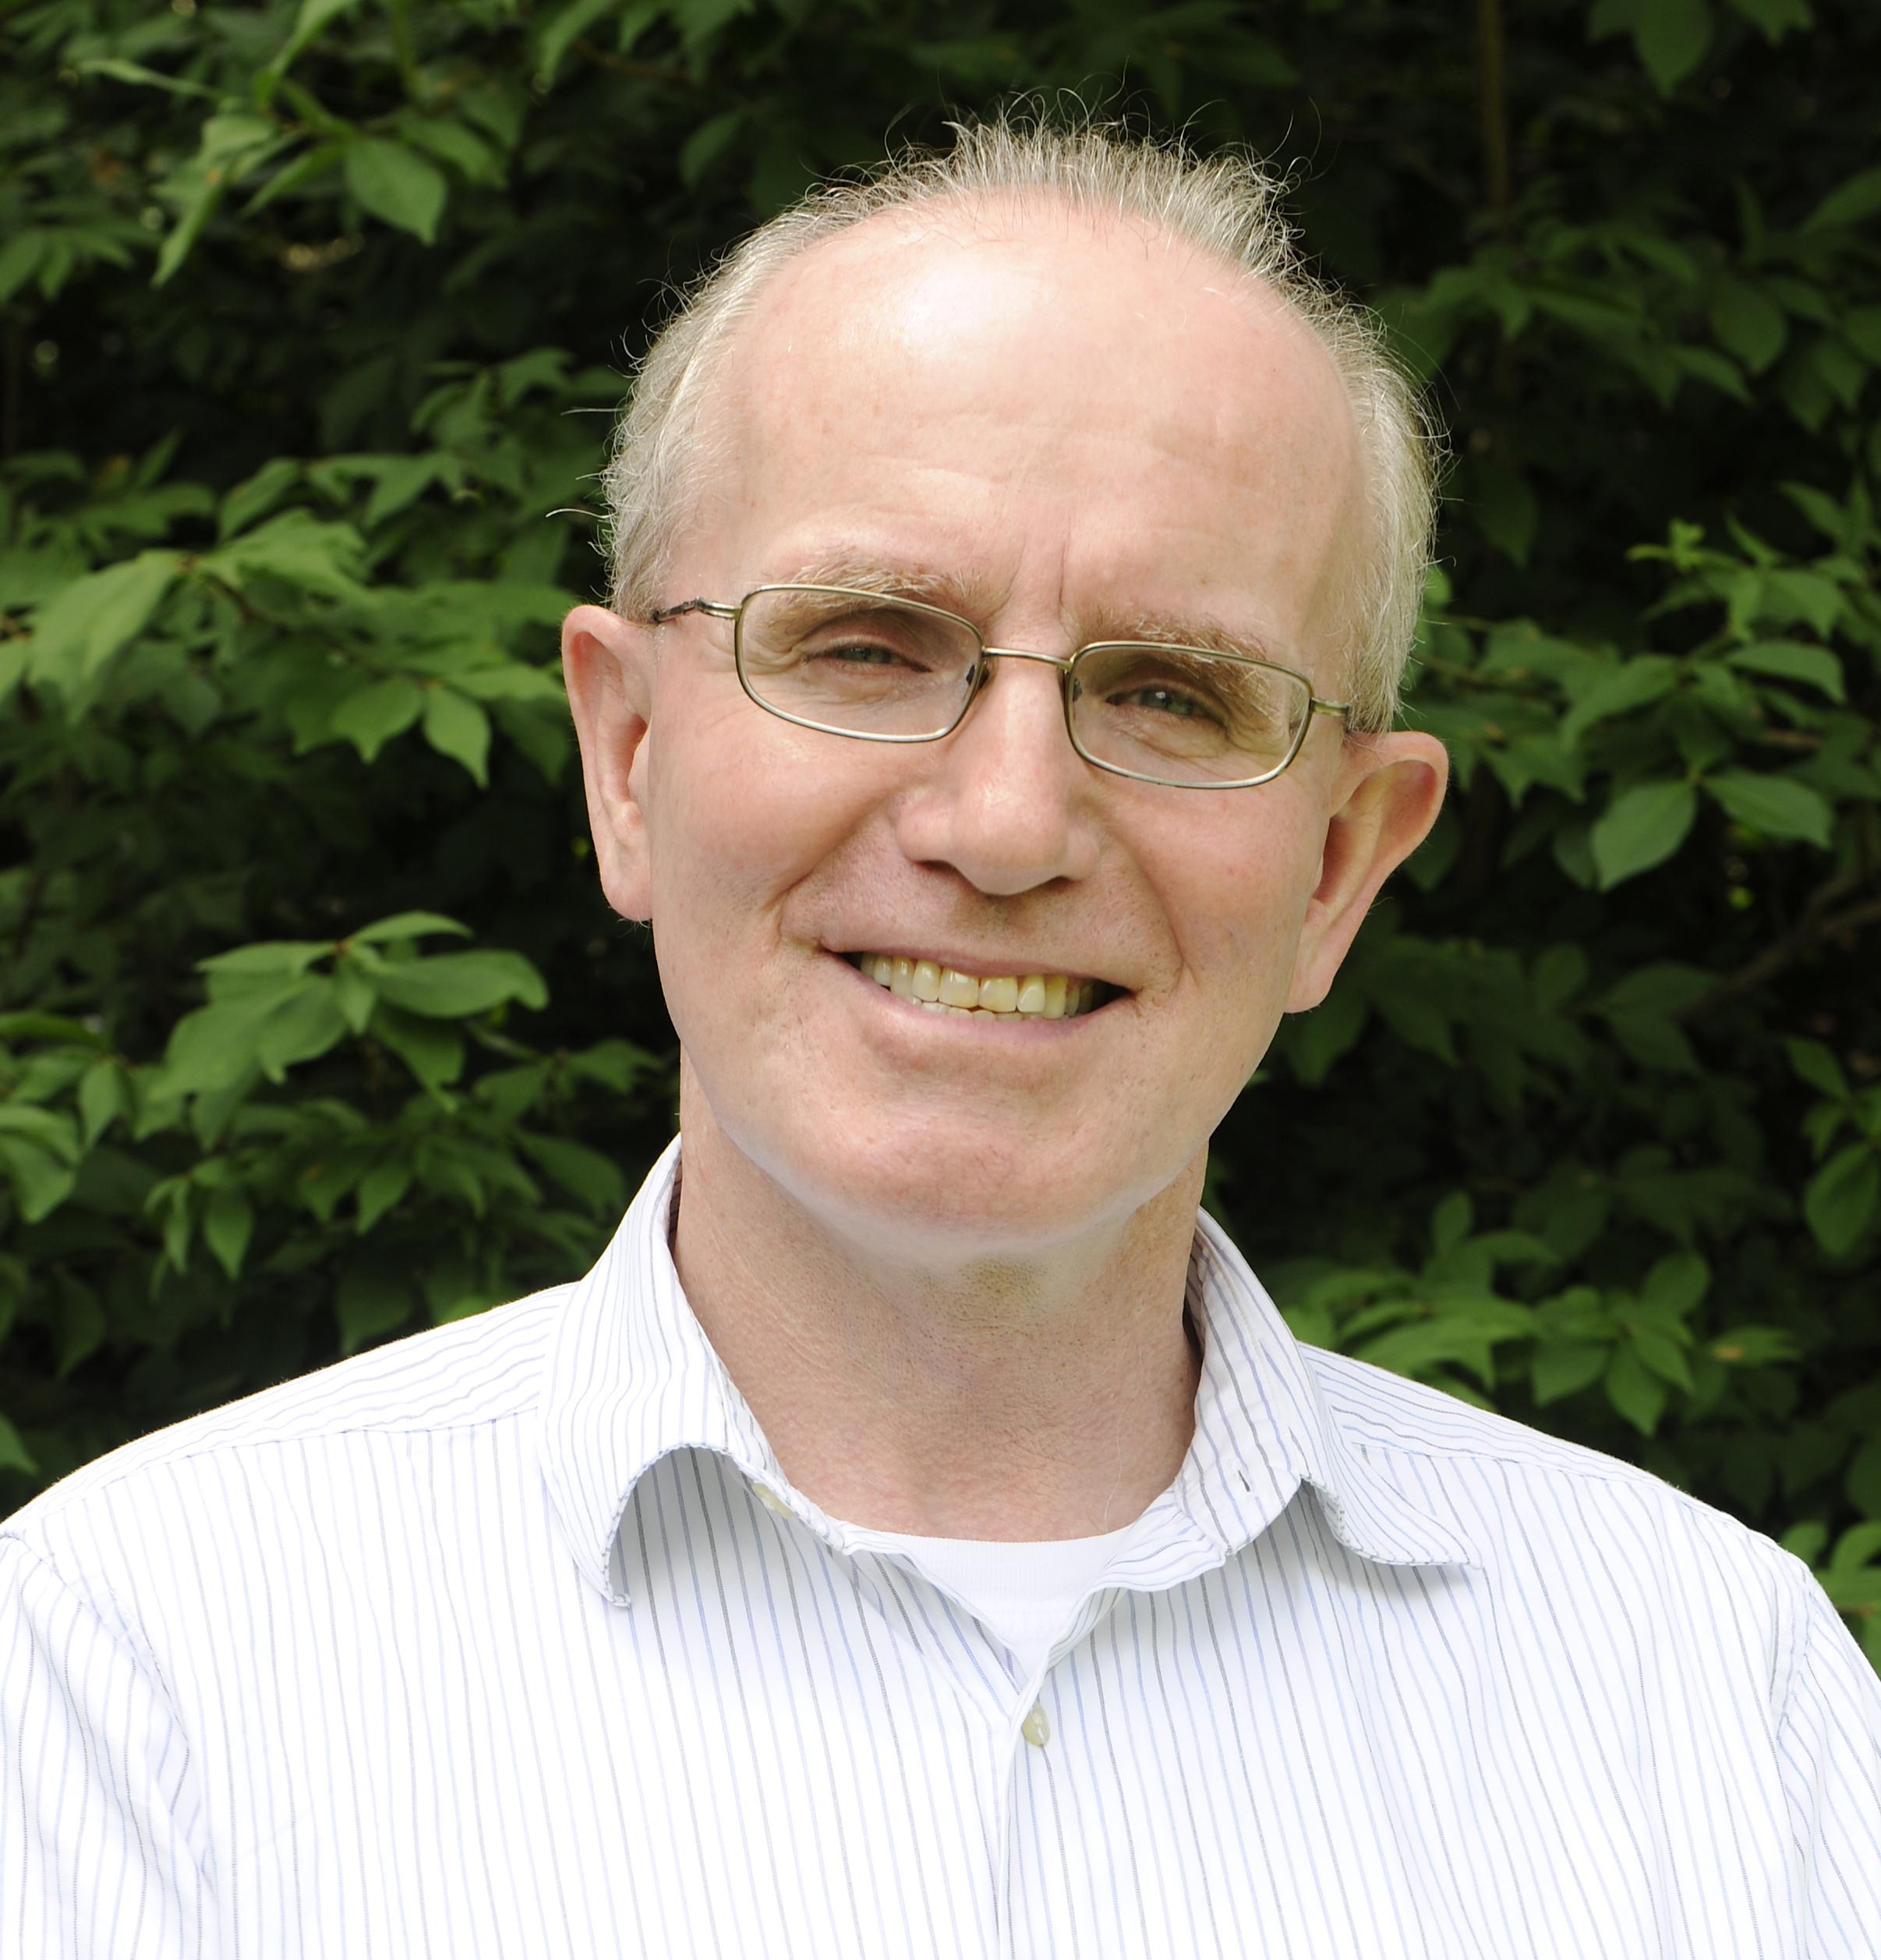 Michael O'Loughlin, Ph.D.